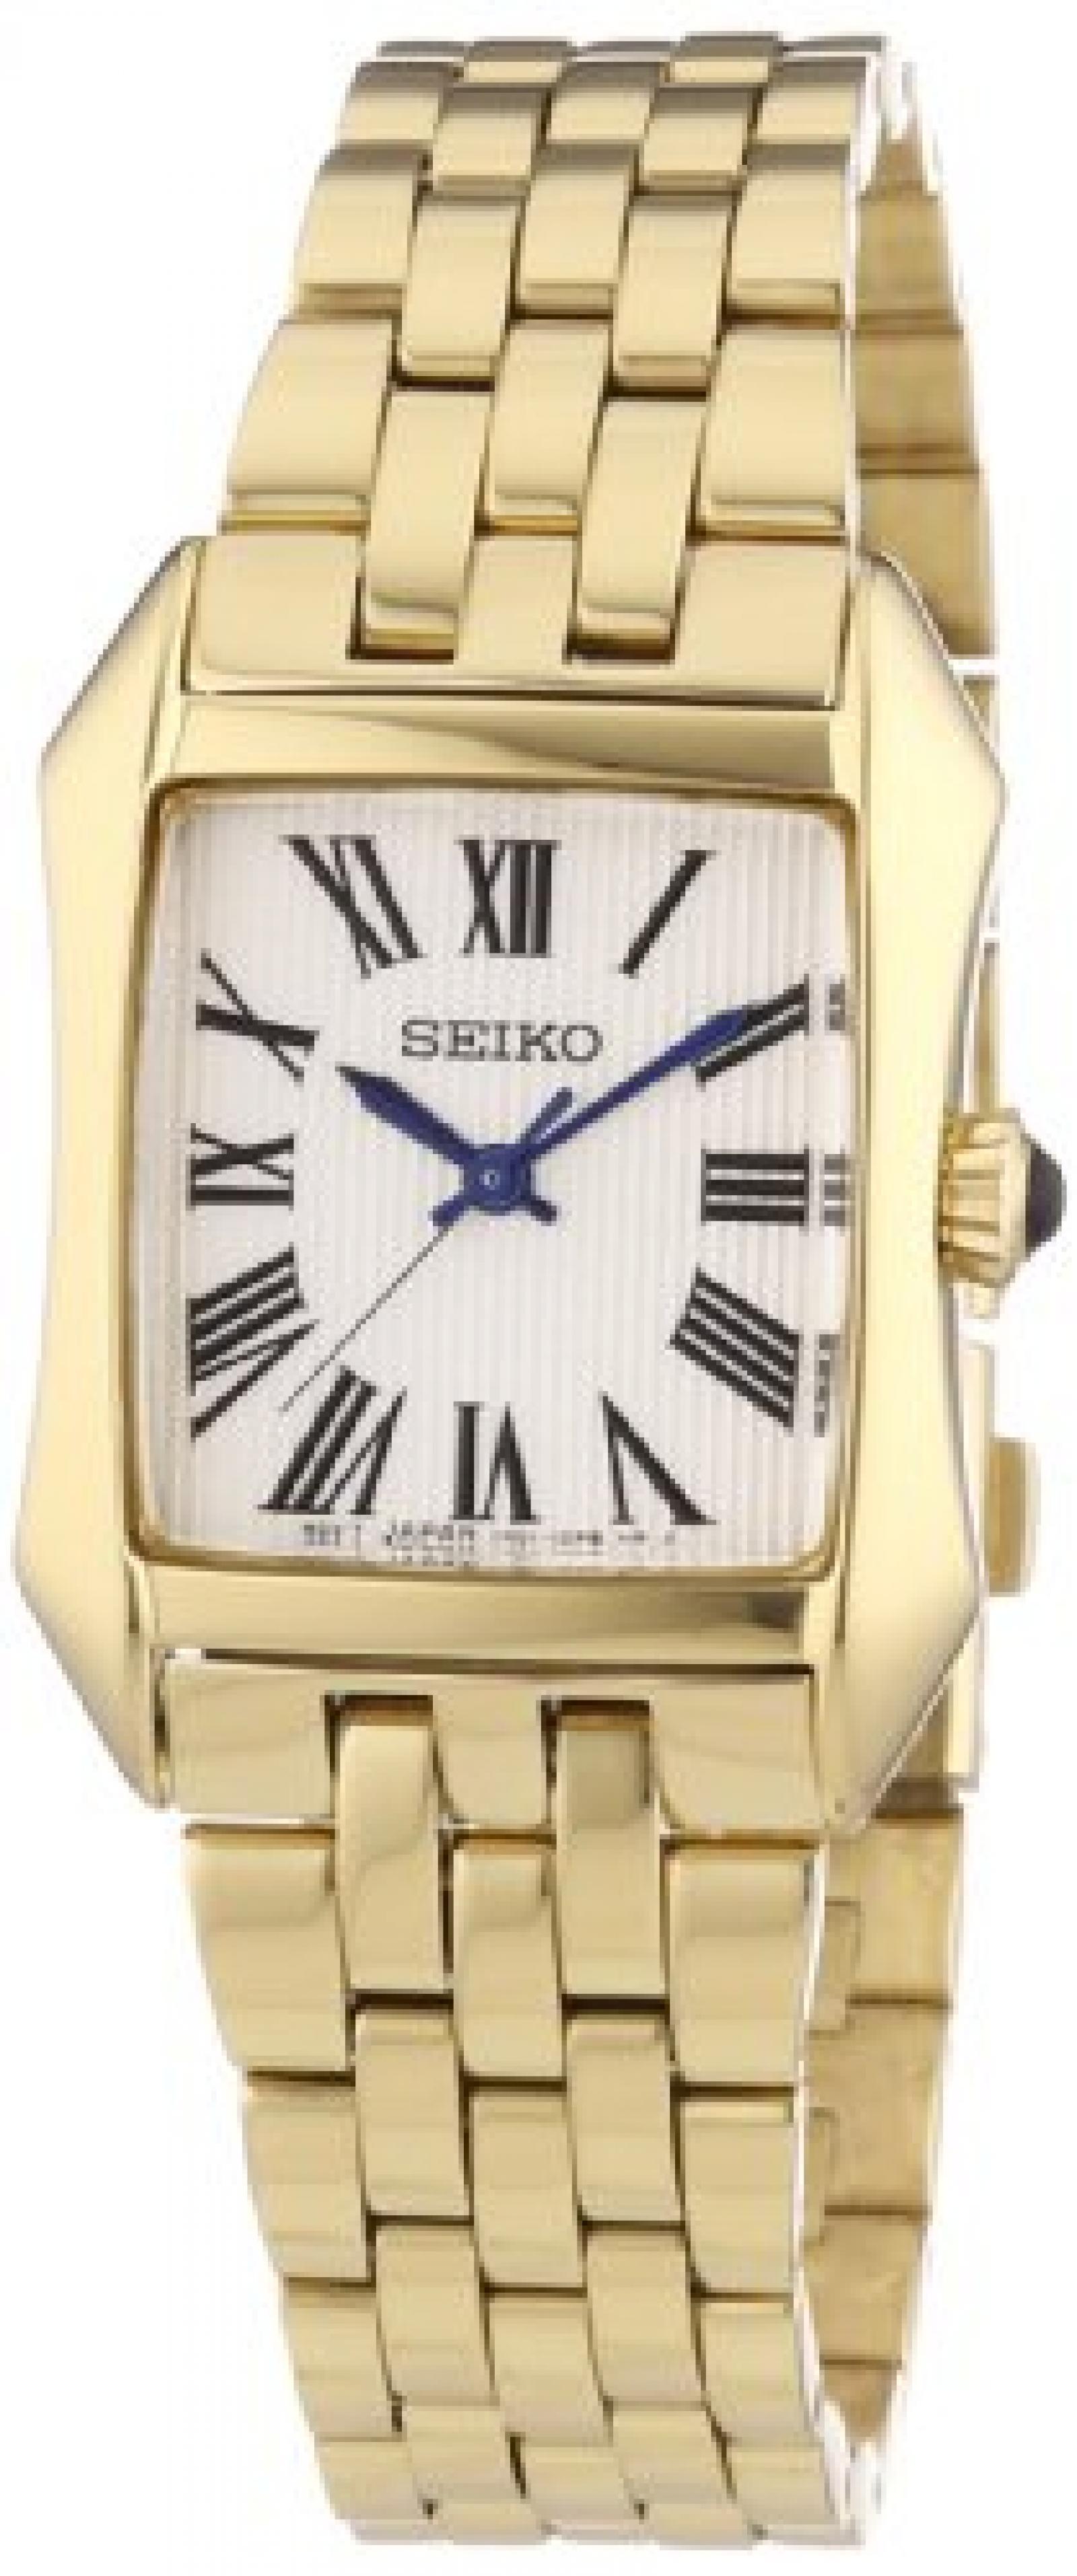 Seiko Damen-Armbanduhr Analog Quarz Edelstahl beschichtet SXGP22P1